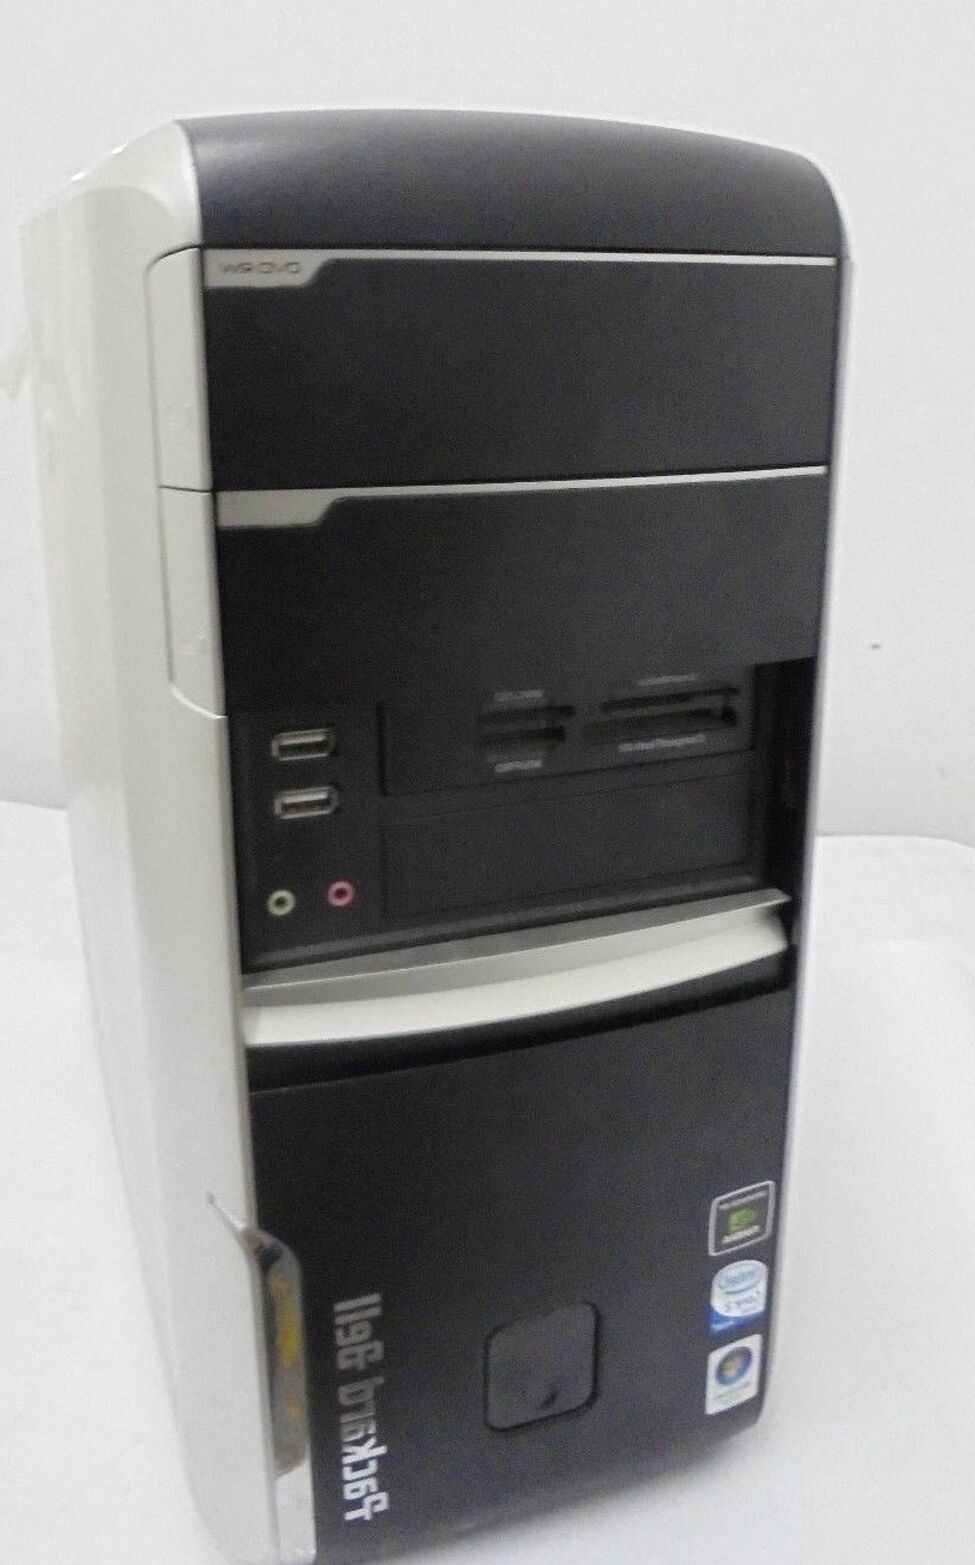 packard bell desktop pc for sale